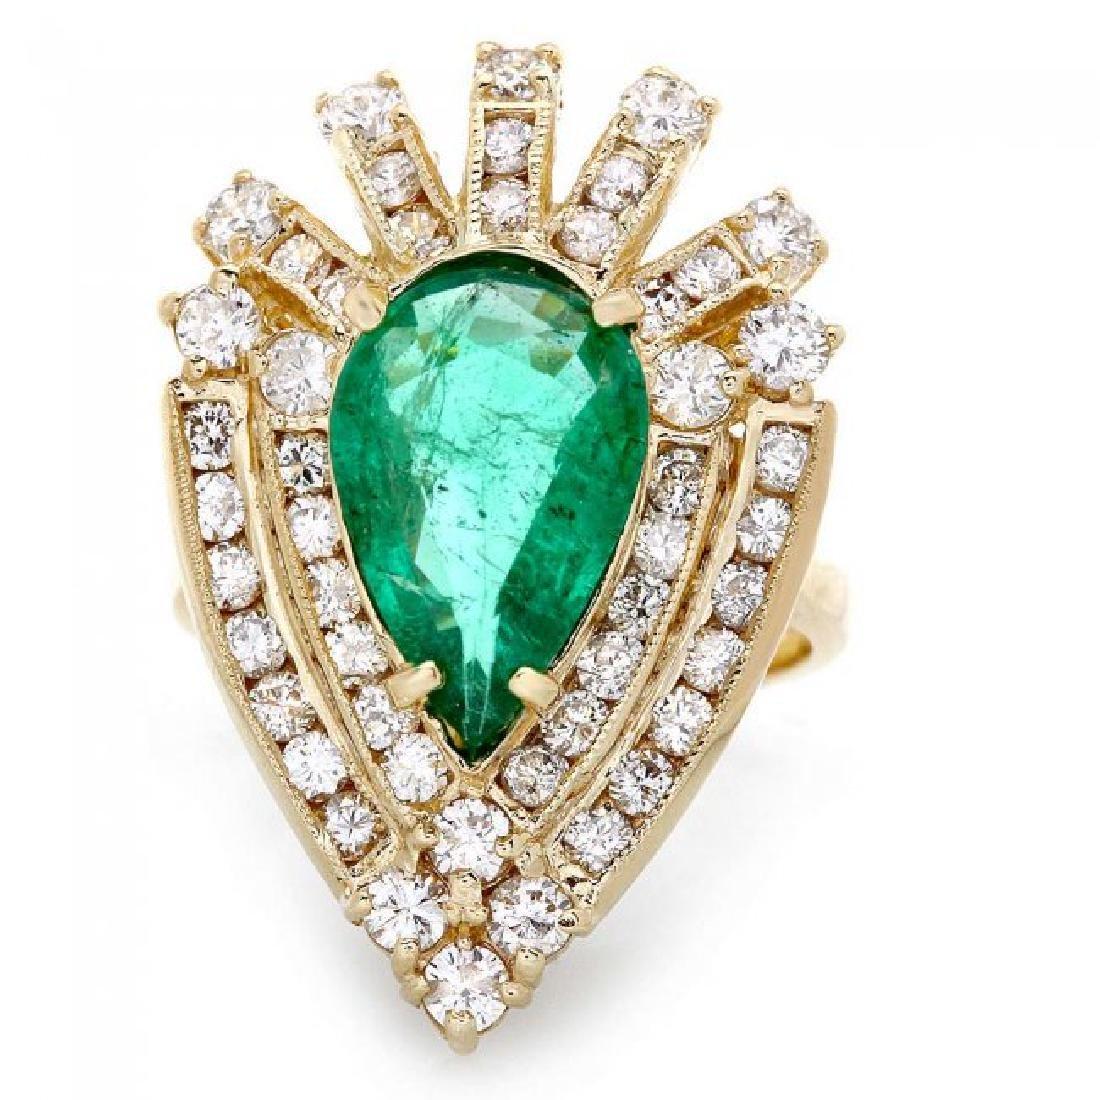 14k Gold 3.00ct Emerald 2.00ct Diamond Ring - 2